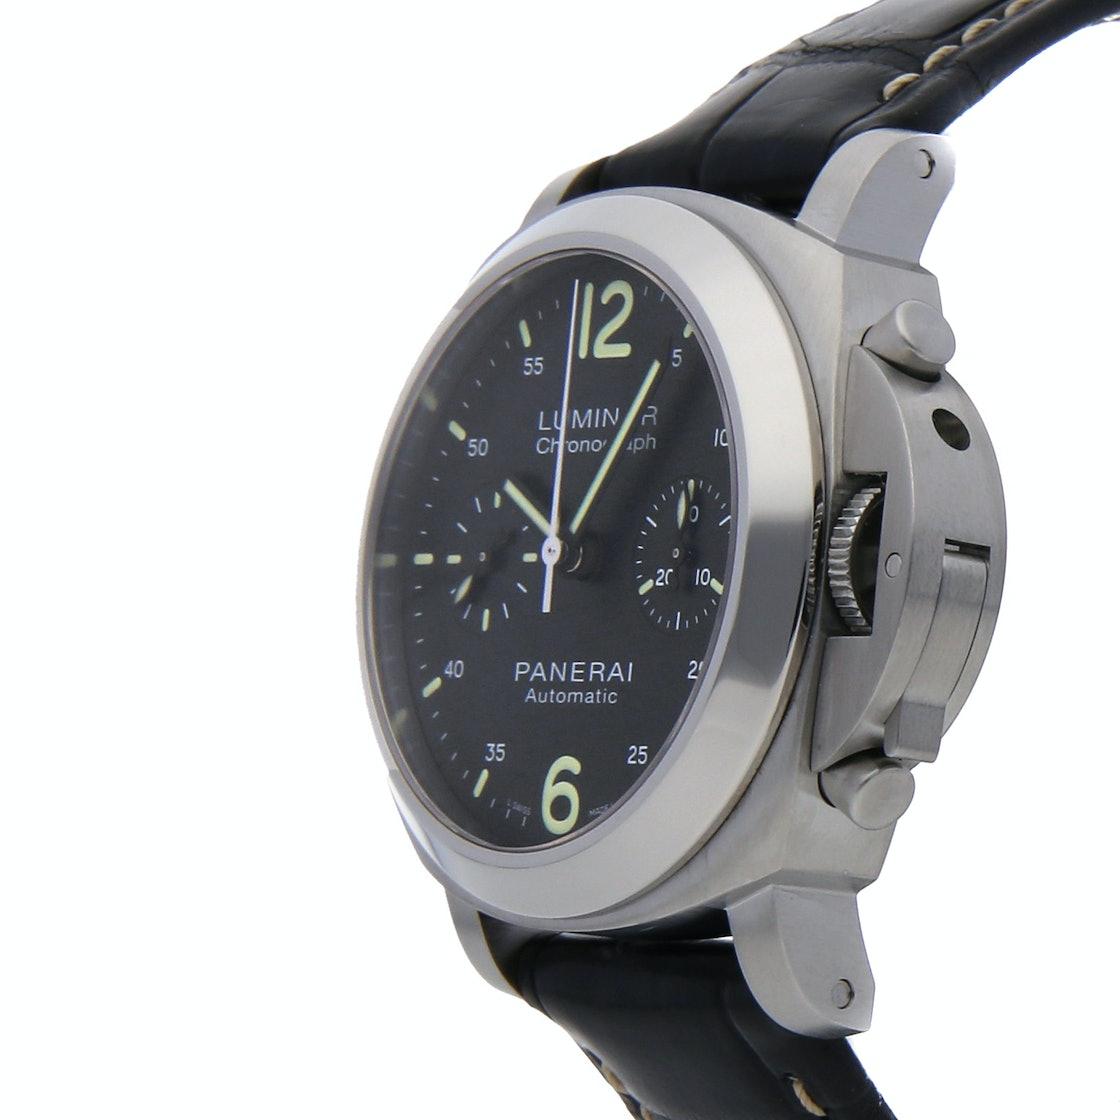 Panerai Luminor Chronograph PAM 310